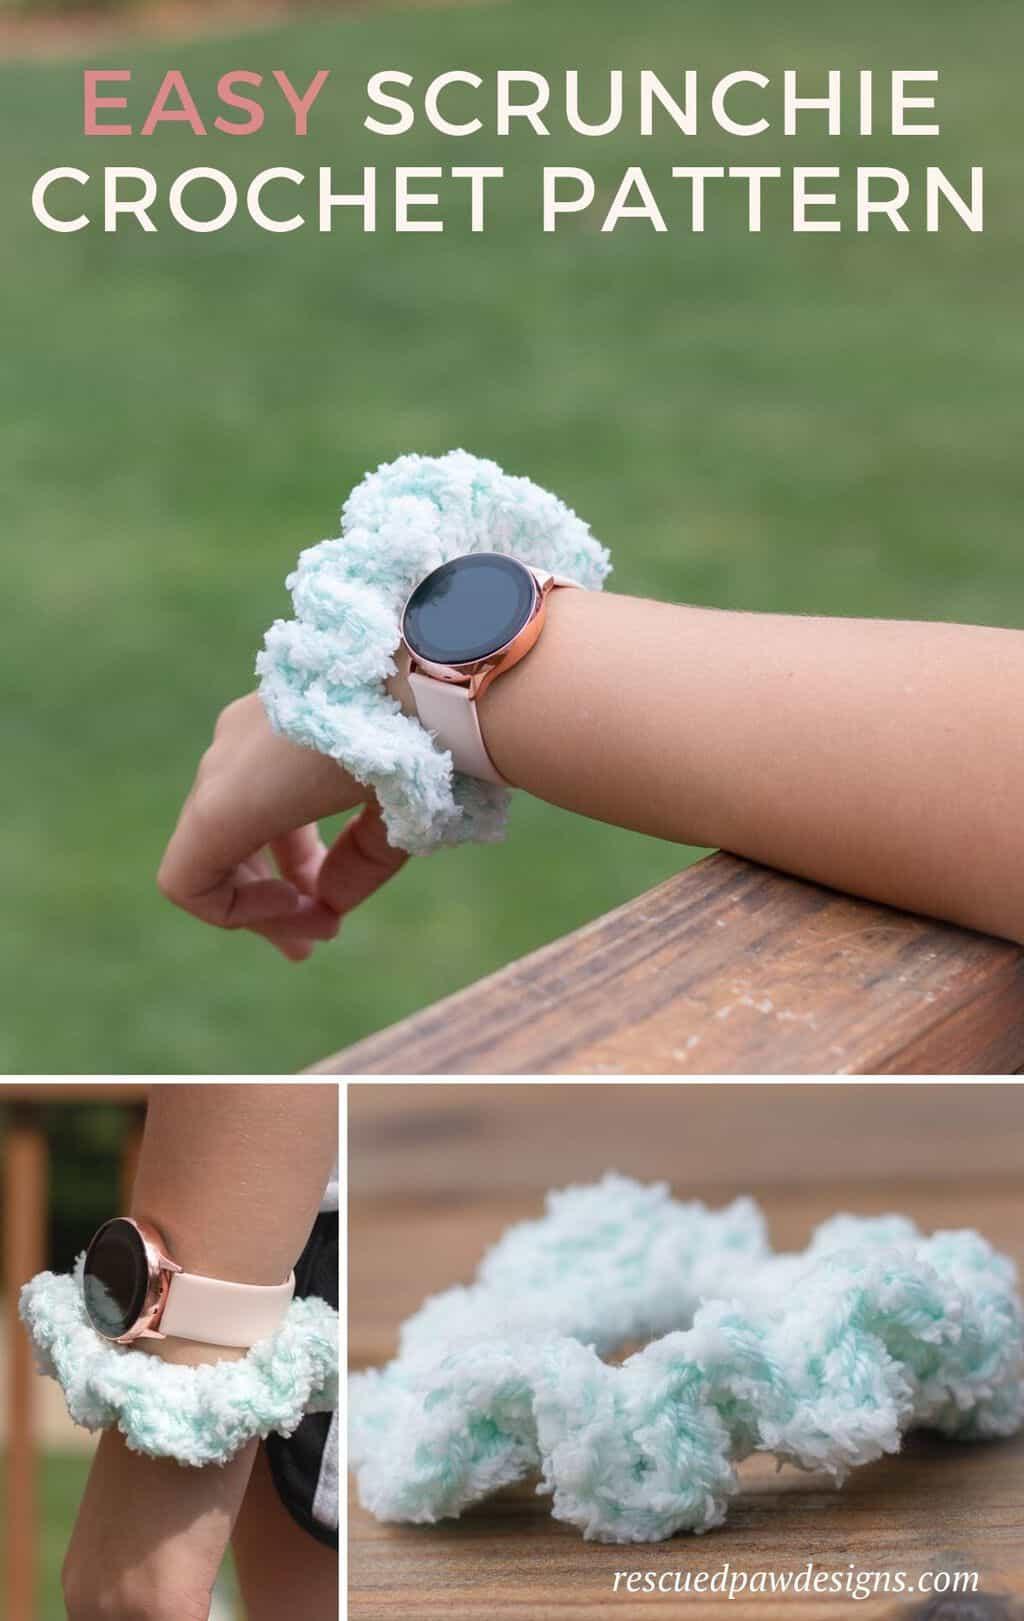 Crochet Scrunchie Hair and Wrist Pattern